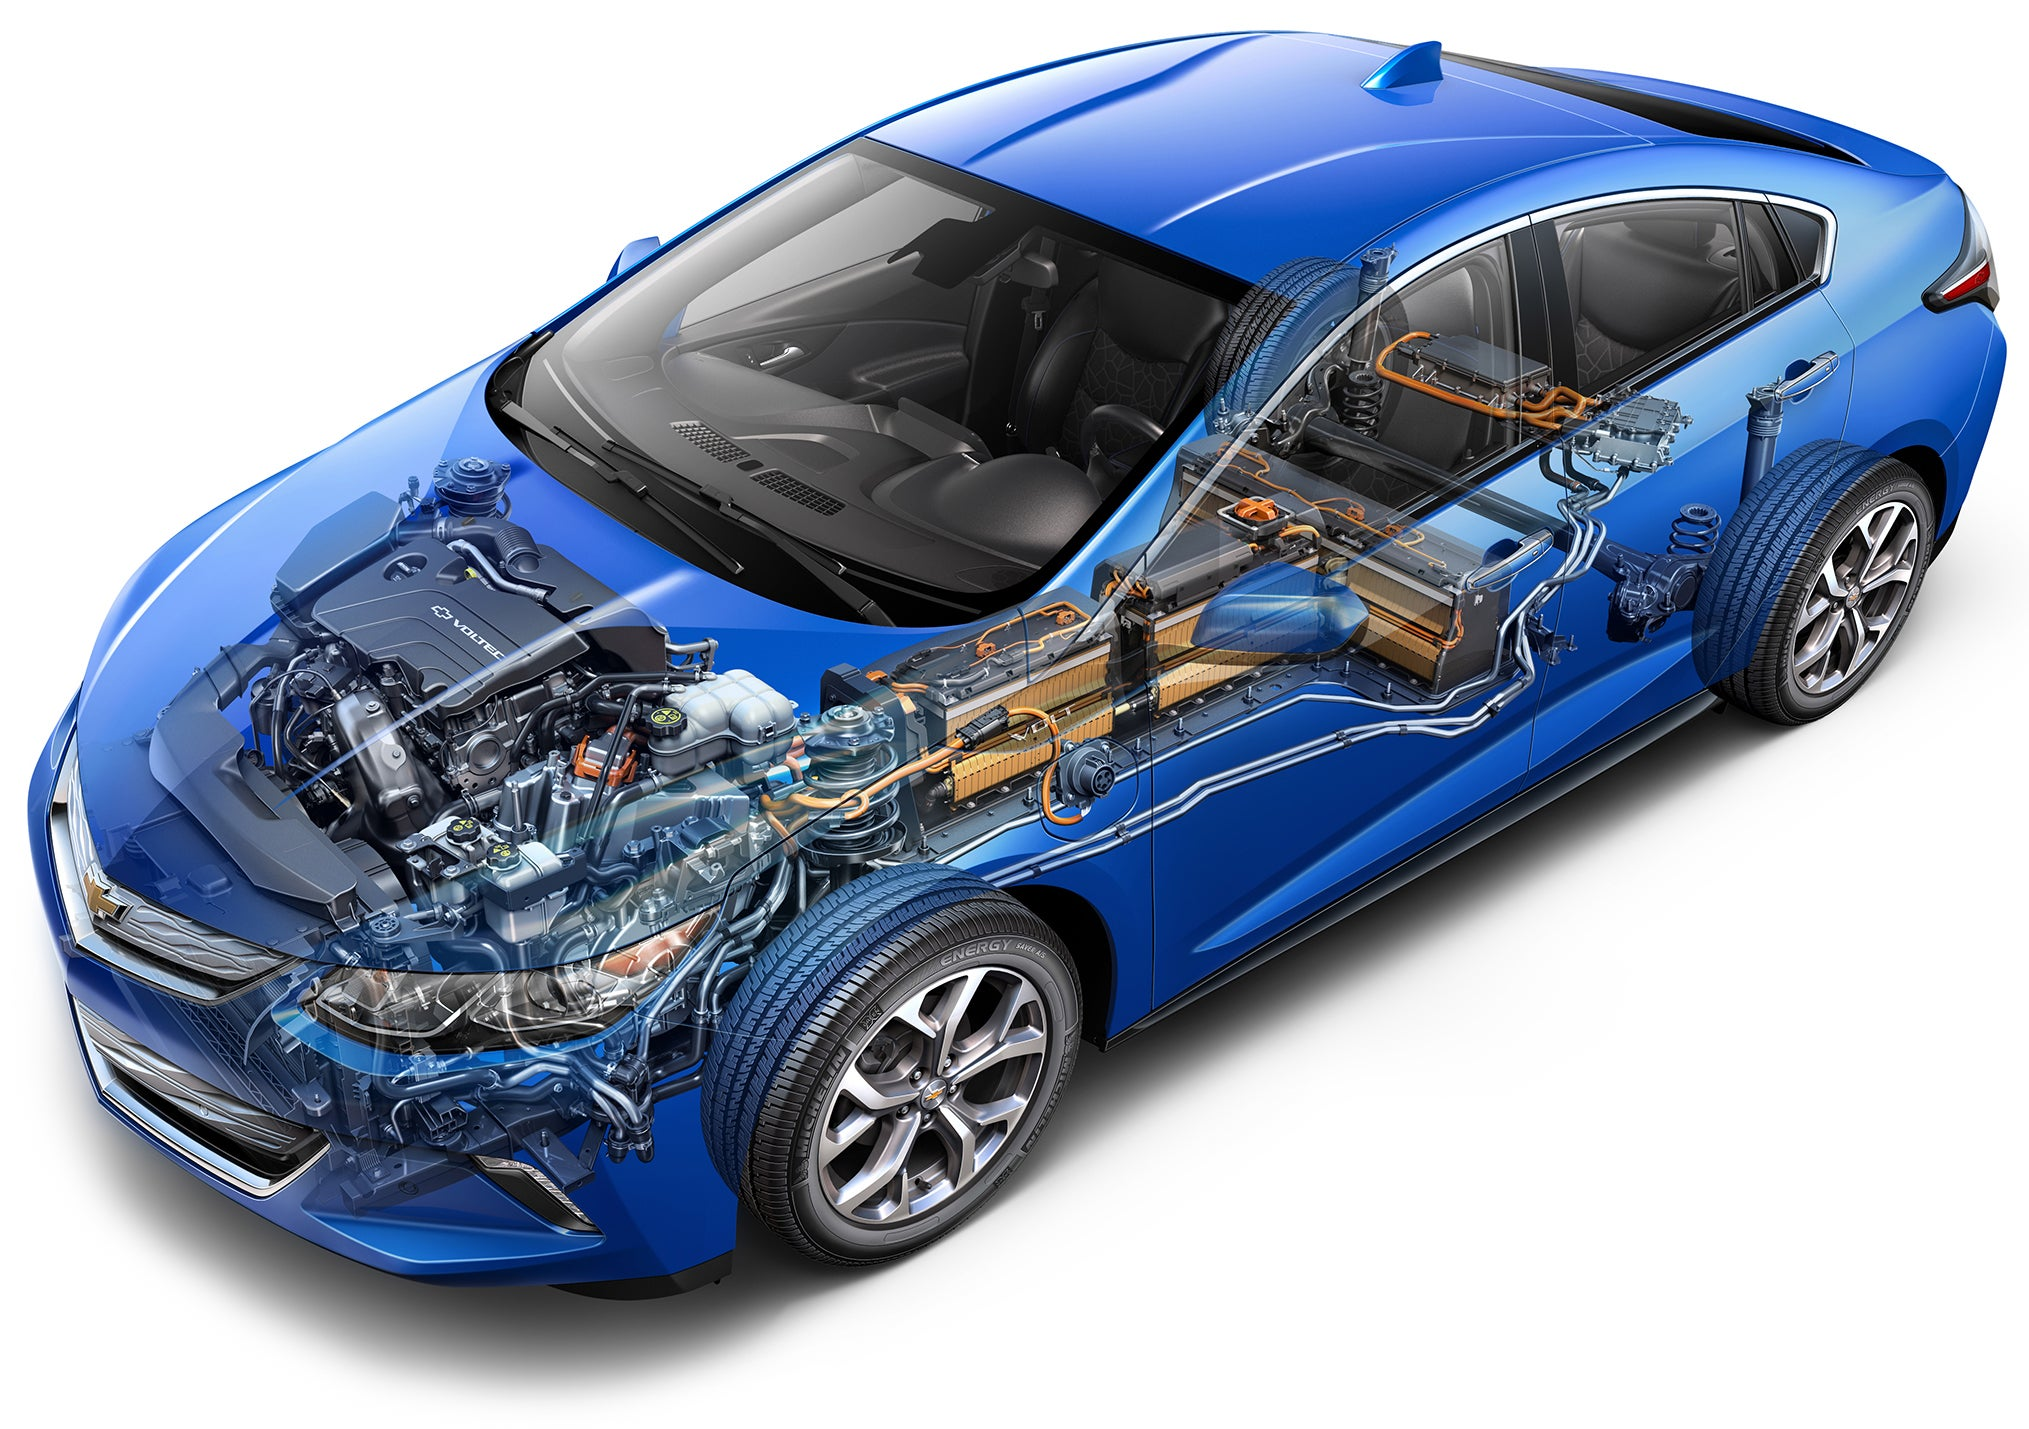 inside the Chevrolet 2016 Volt electric car